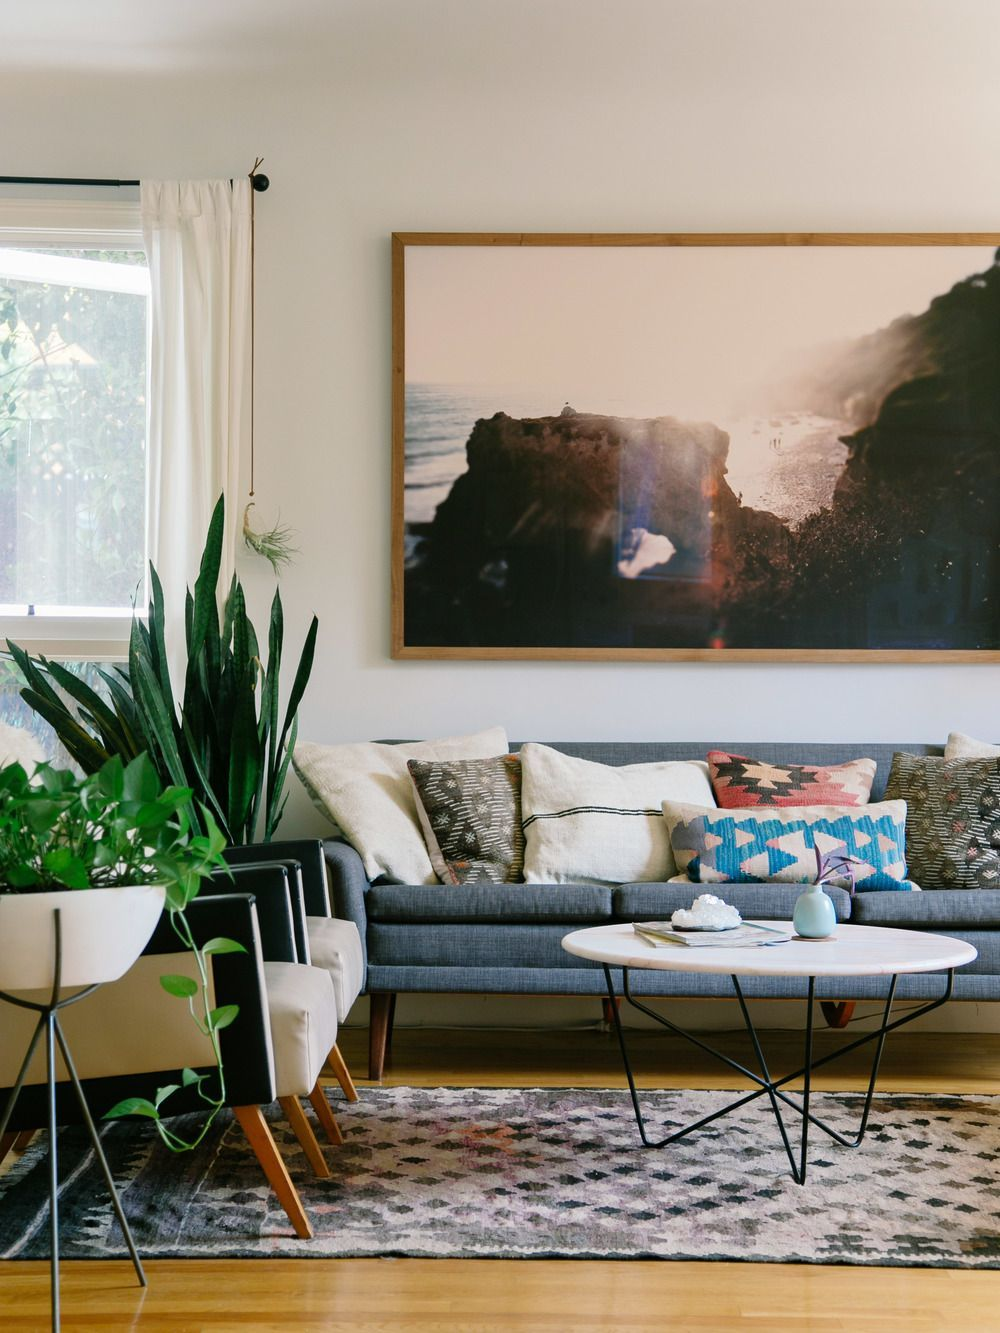 Pin By Keegan Adriance On Home Decor | Mid Century Modern Living Room Design, Bohemian Living Room Decor, Mid Century Modern Living Room